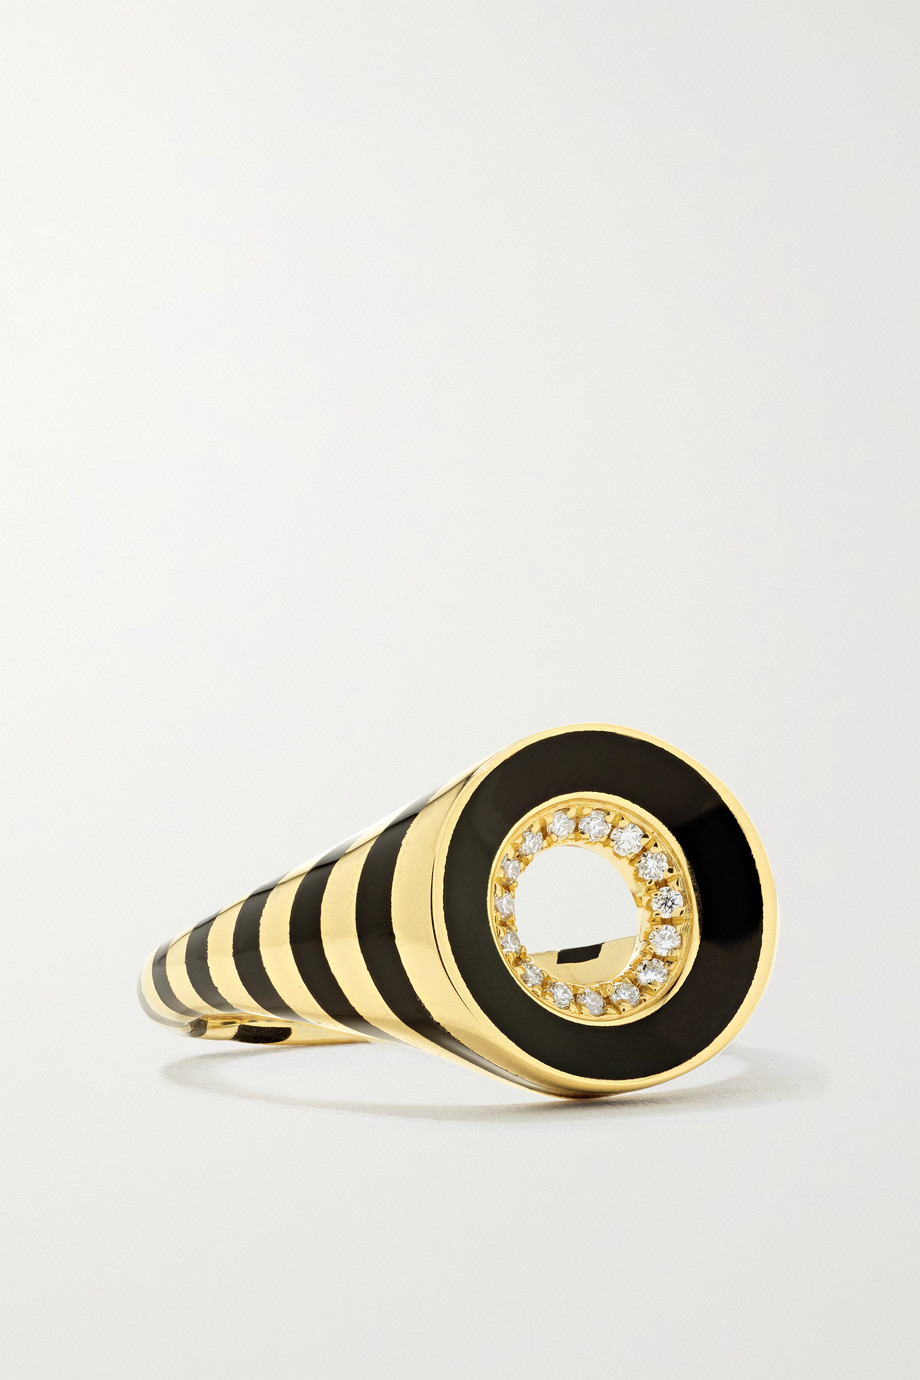 State Property Rinzō 18-karat gold, enamel and diamond ring